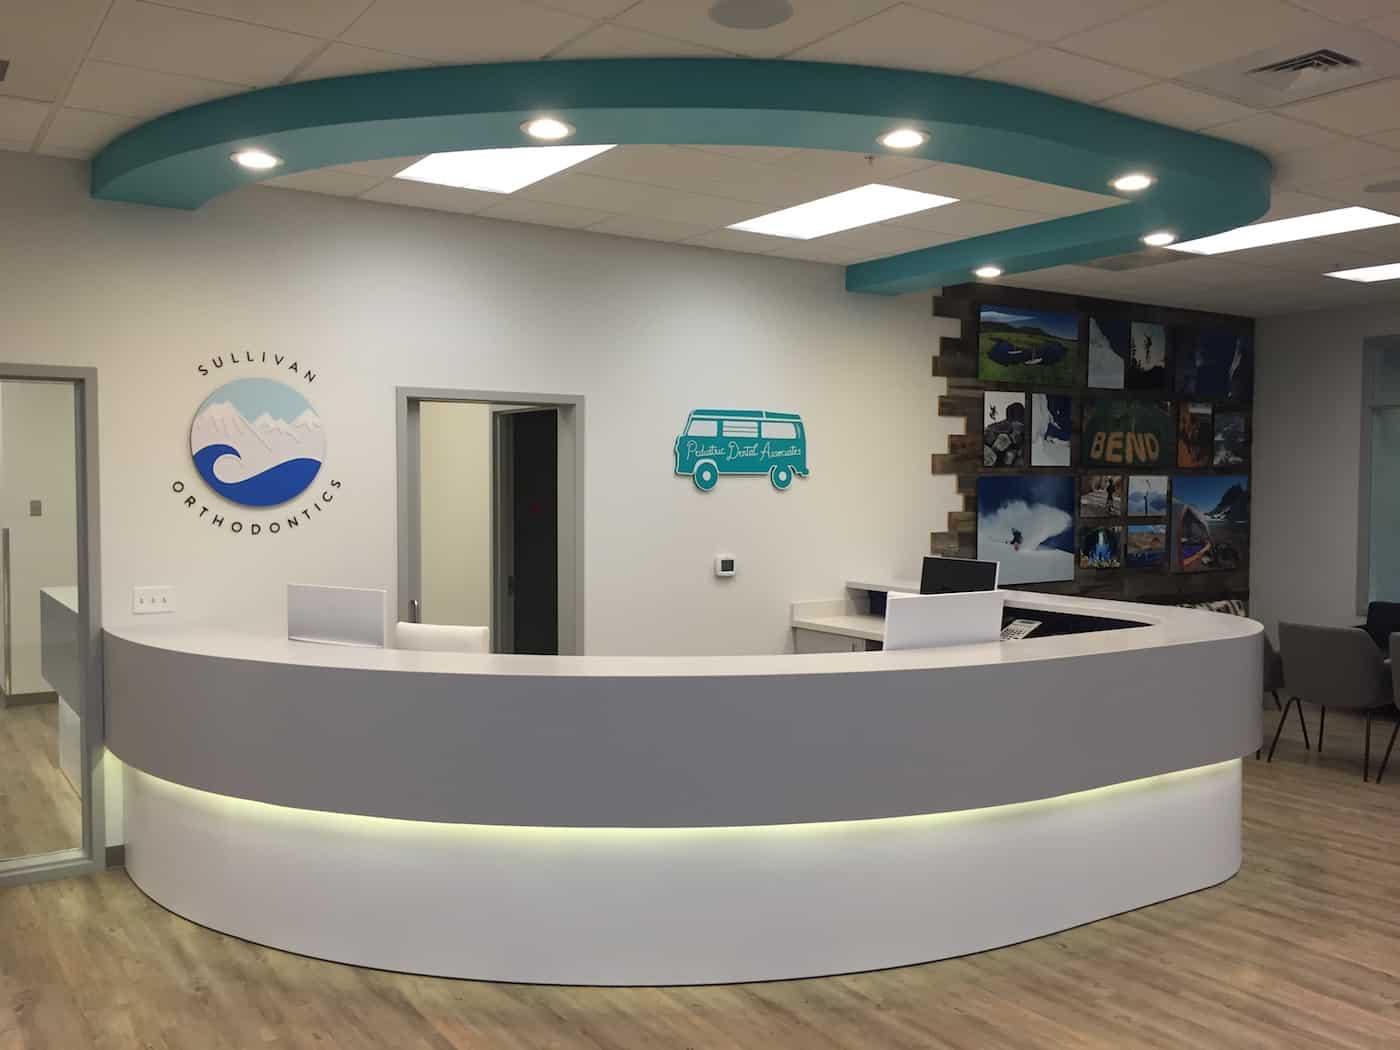 Sullivan Orthodontics Bend Office 760 NW York Drive, Suite 110 Bend, OR 97703